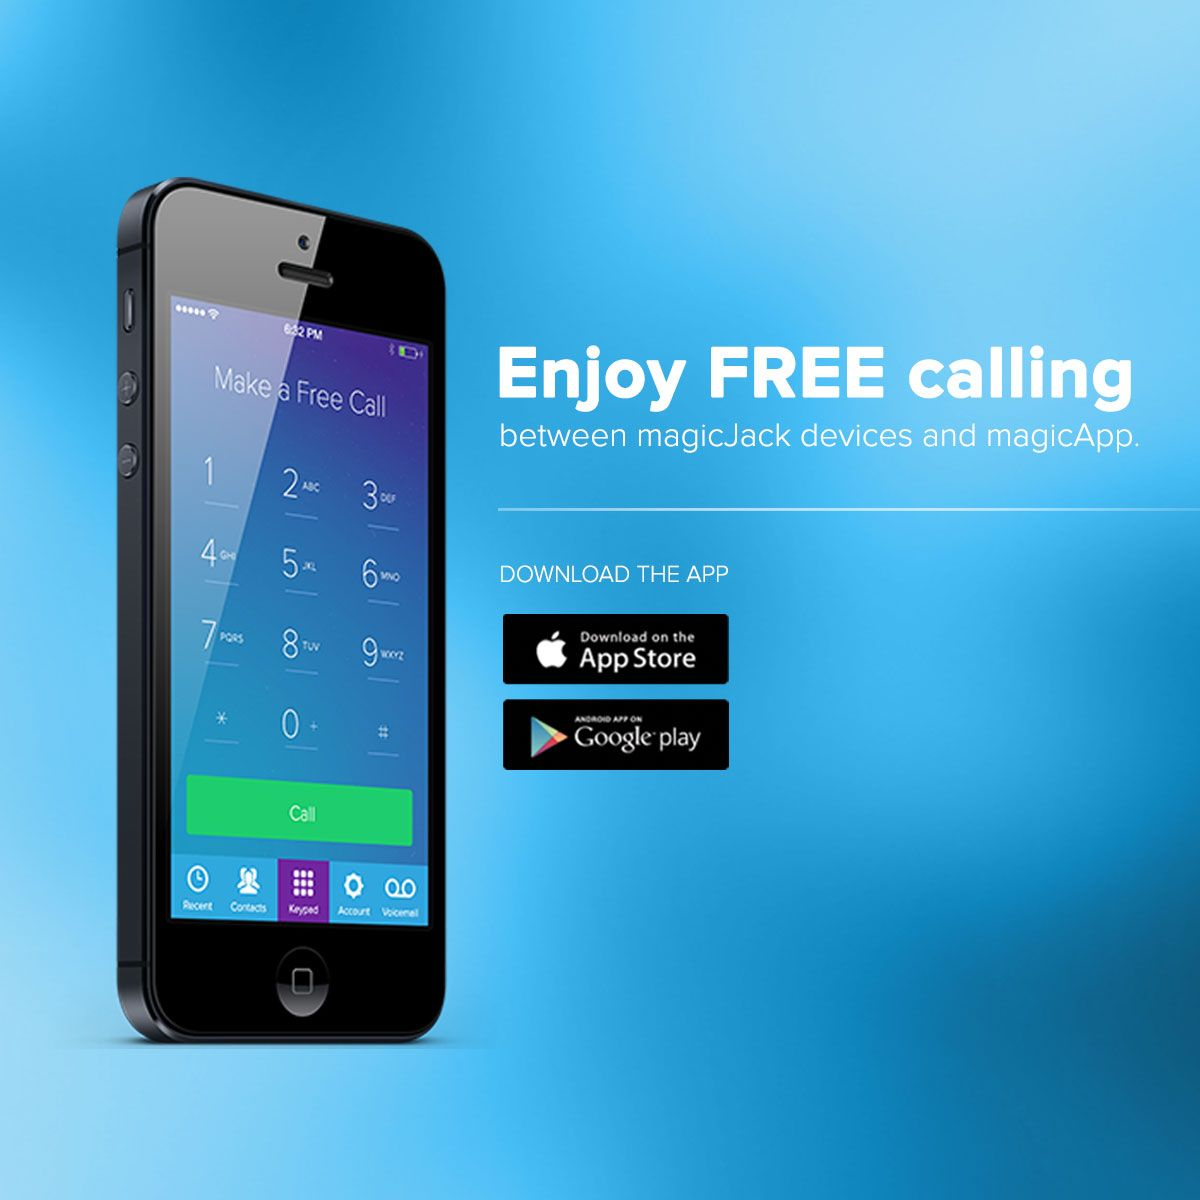 Download magicApp and enjoy FREE calling between magicJack